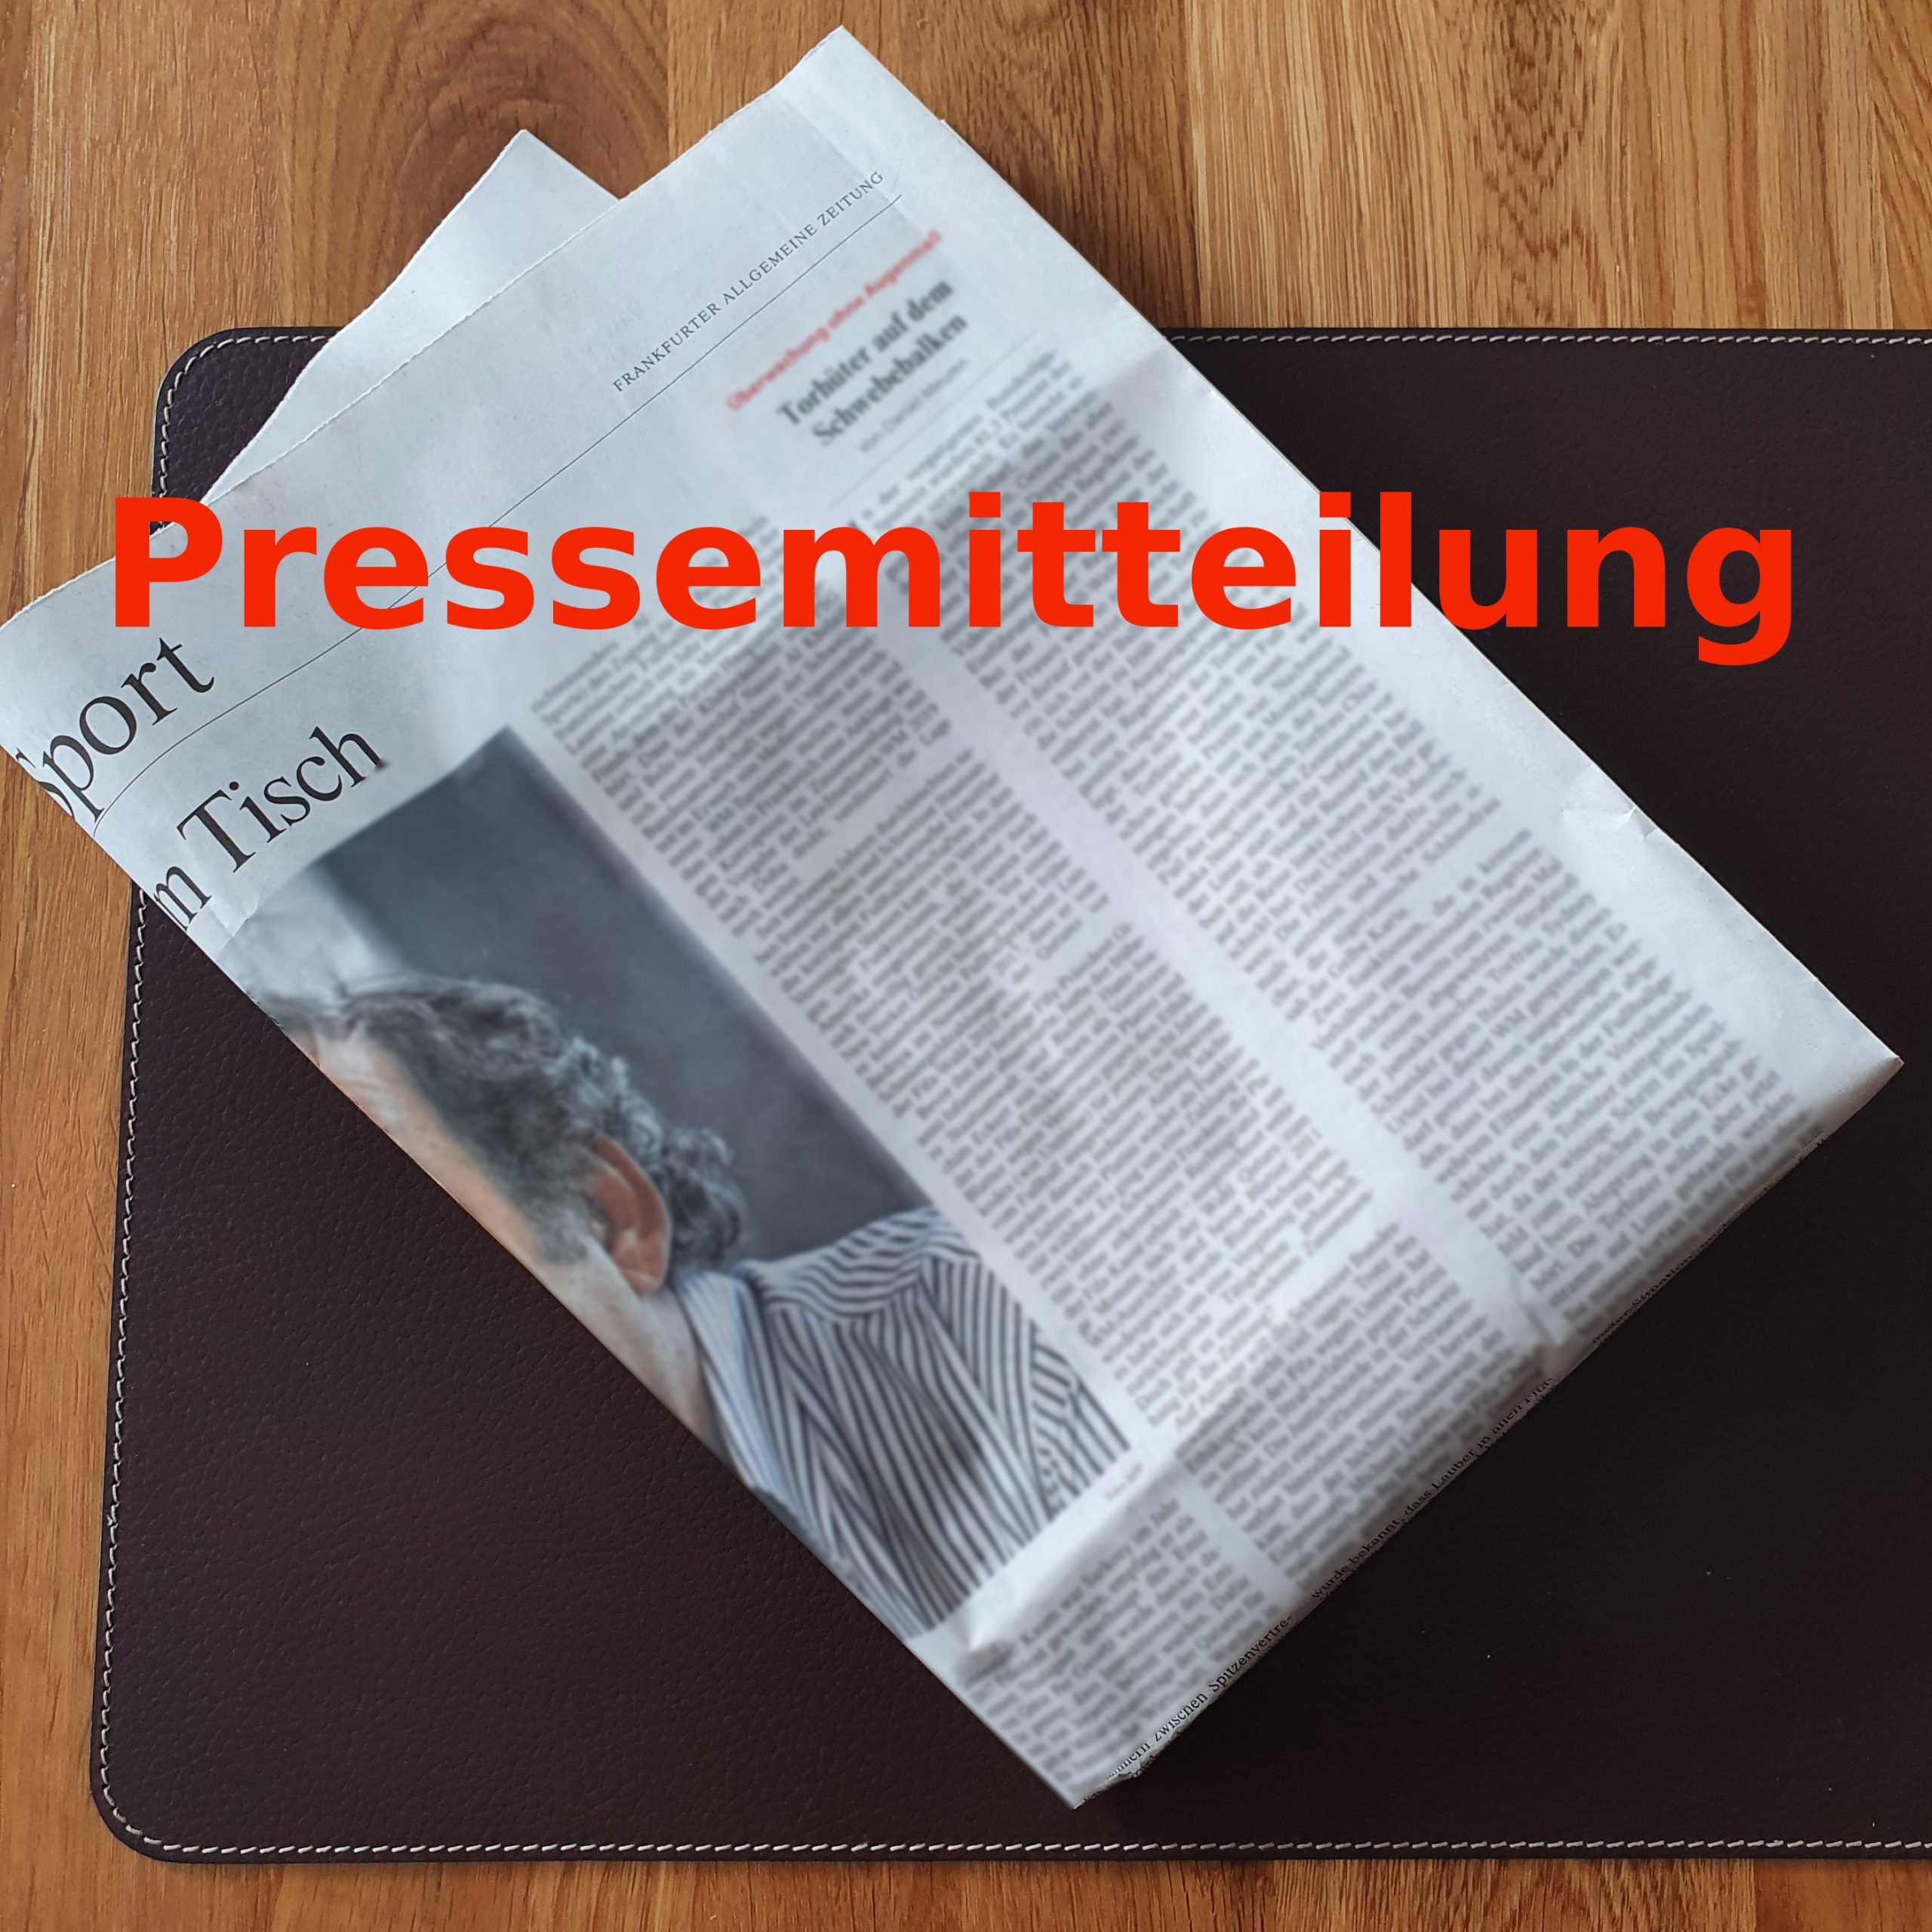 Pressemitteilung: Dank an Helga Uhrig und Marcus Aulbach